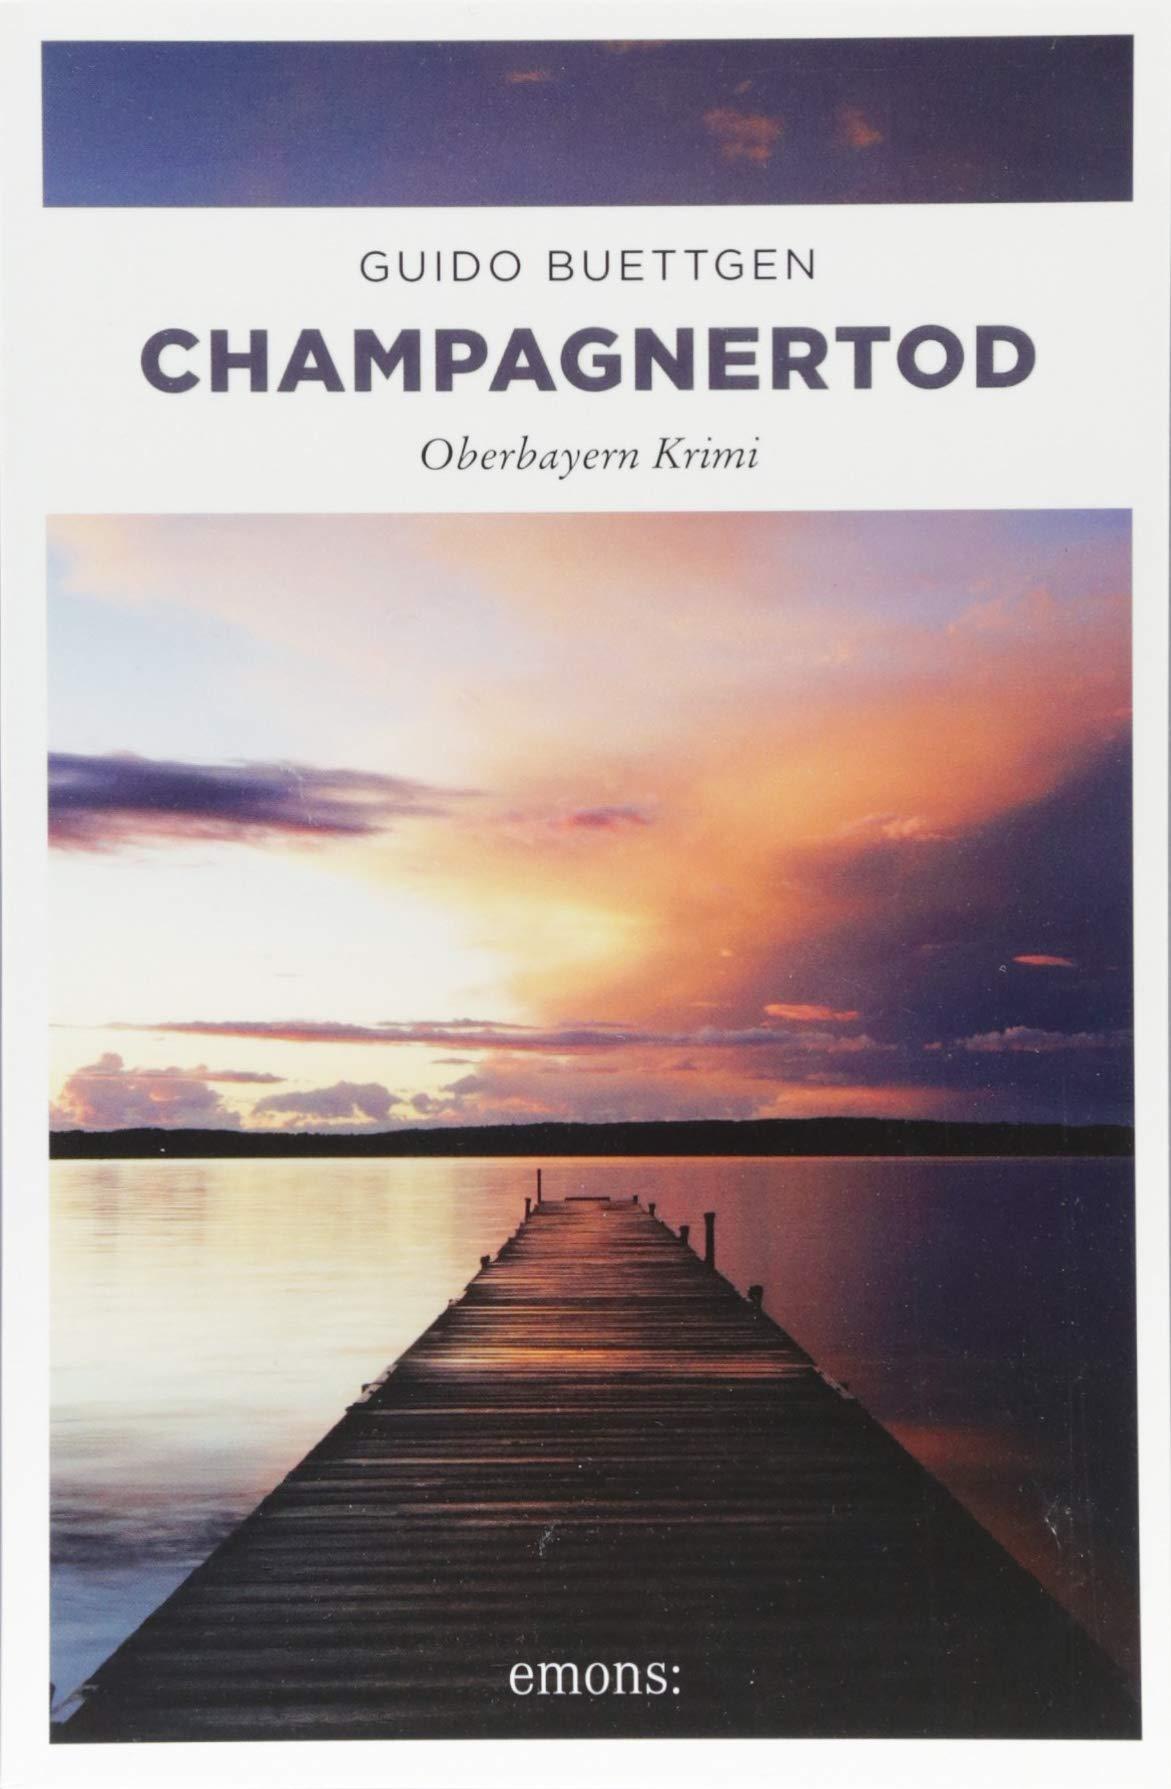 Champagnertod: Oberbayern Krimi